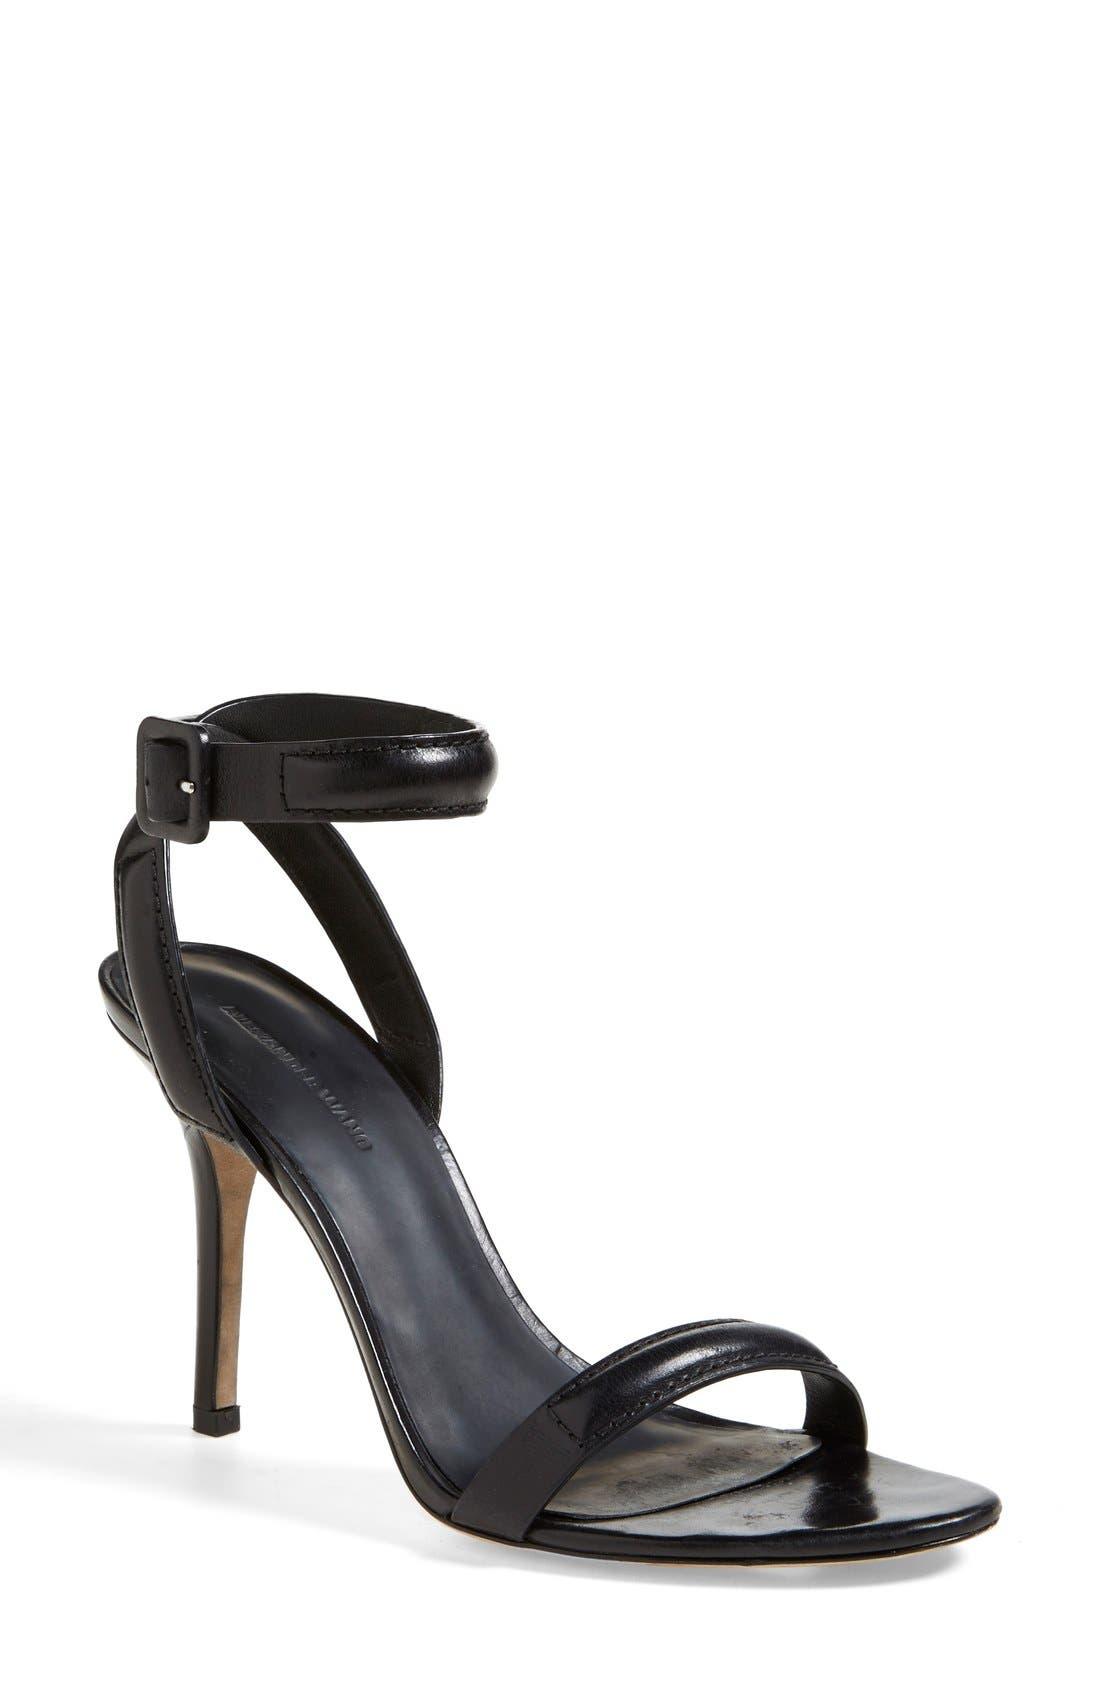 Main Image - Alexander Wang 'Antonia' Ankle Strap Sandal (Women)